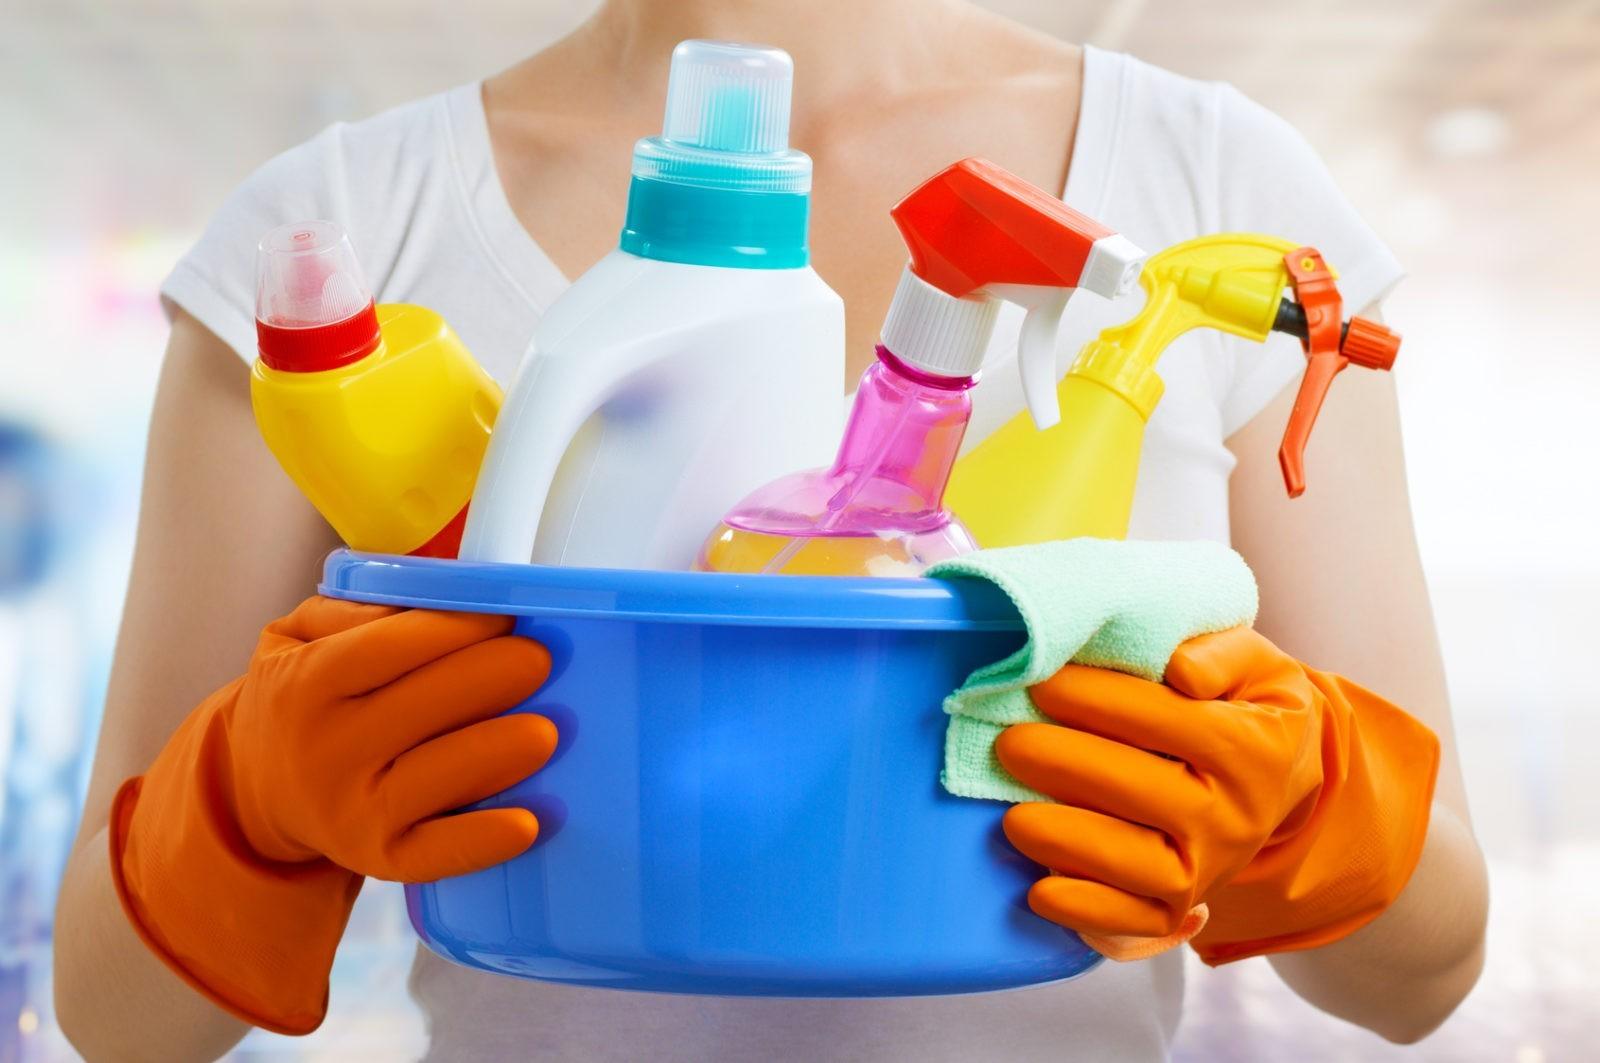 detergenty w domu